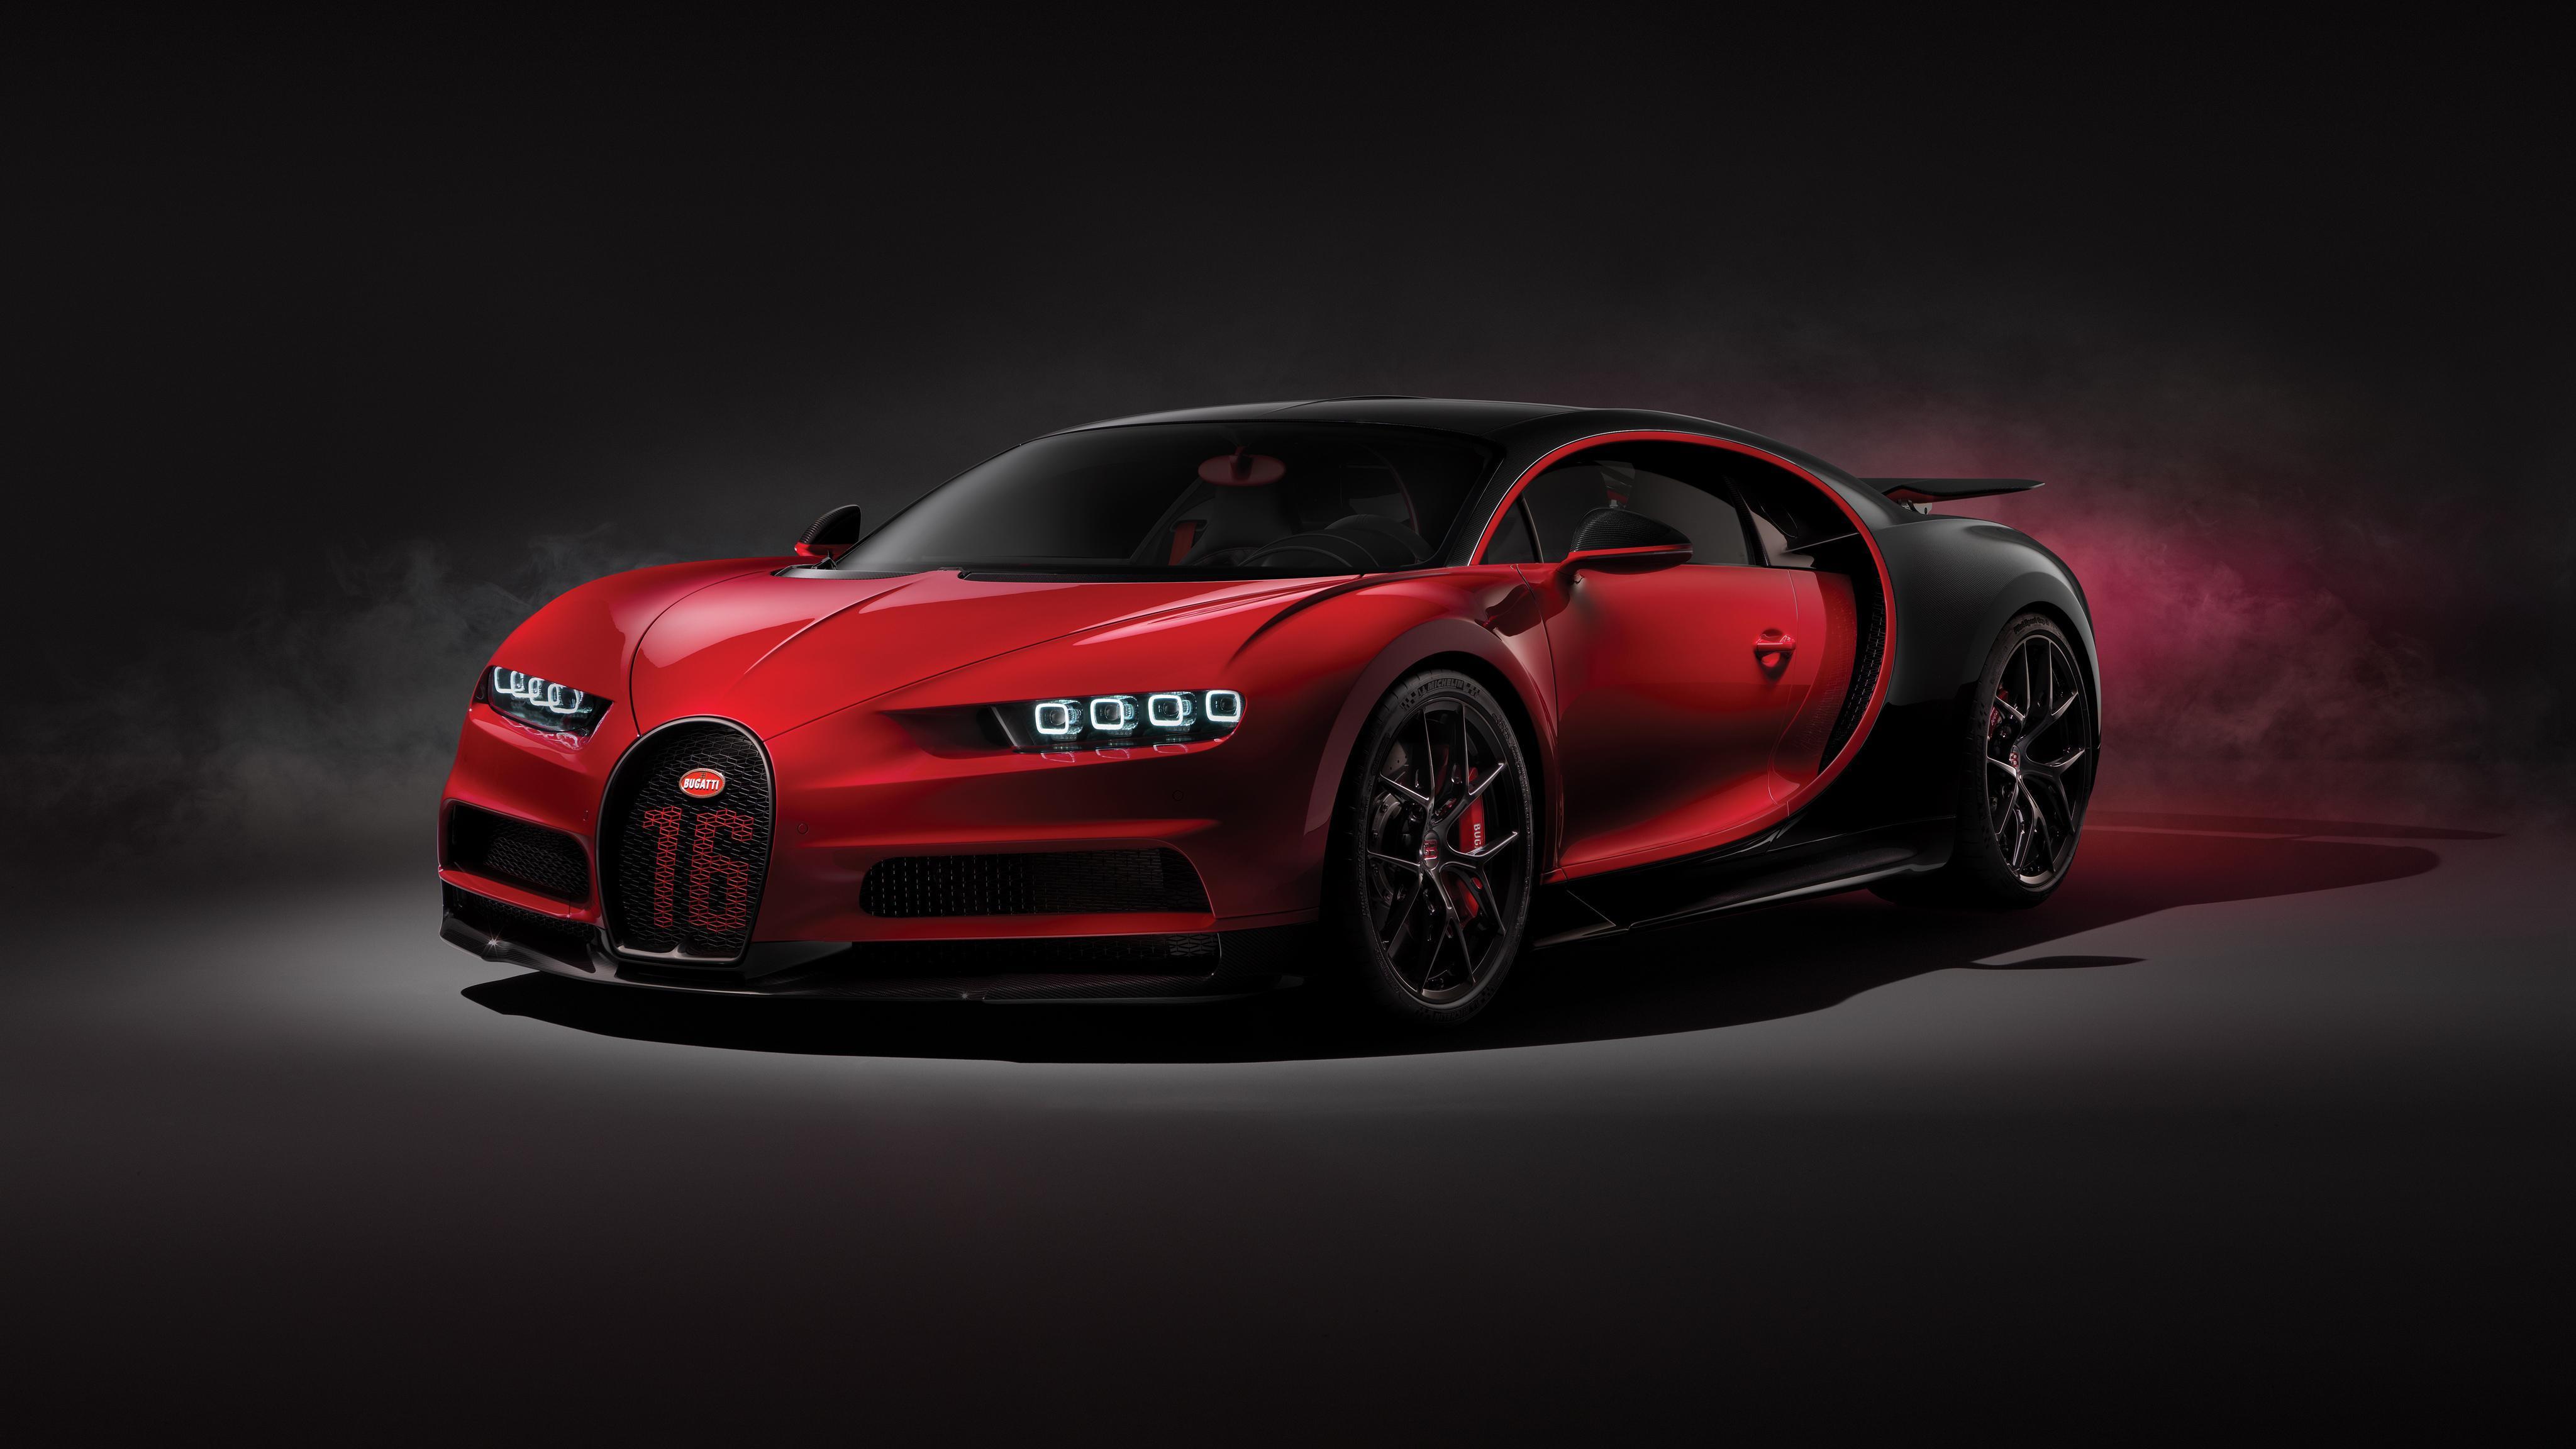 Bugatti Chiron HD Wallpapers - Wallpaper Cave